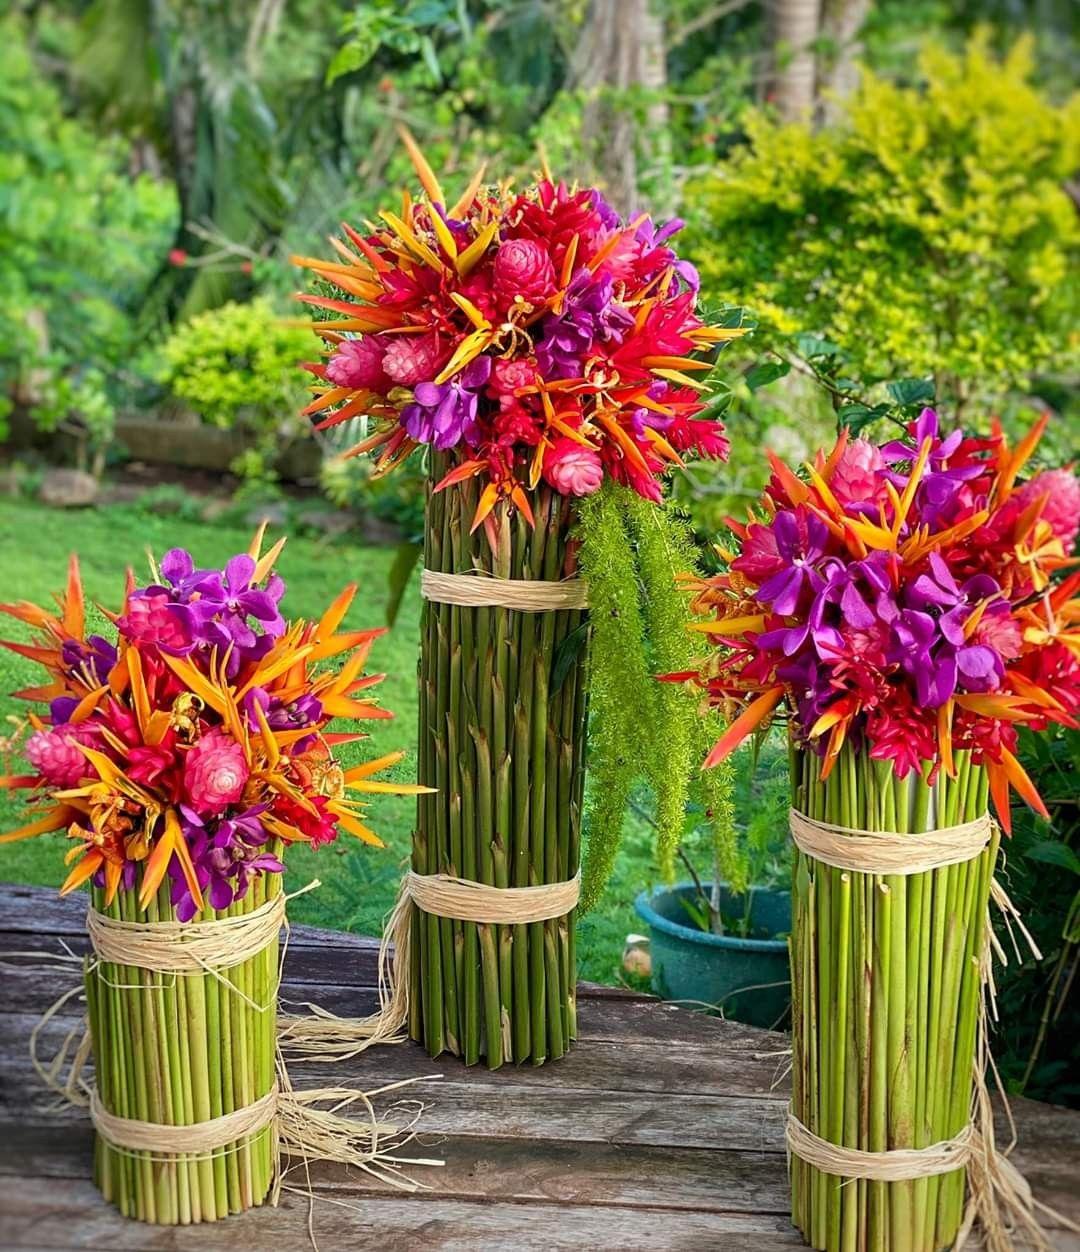 Epingle Par Mihivai Tahiti Sur Marɩage Tropical Fleurit Local En 2020